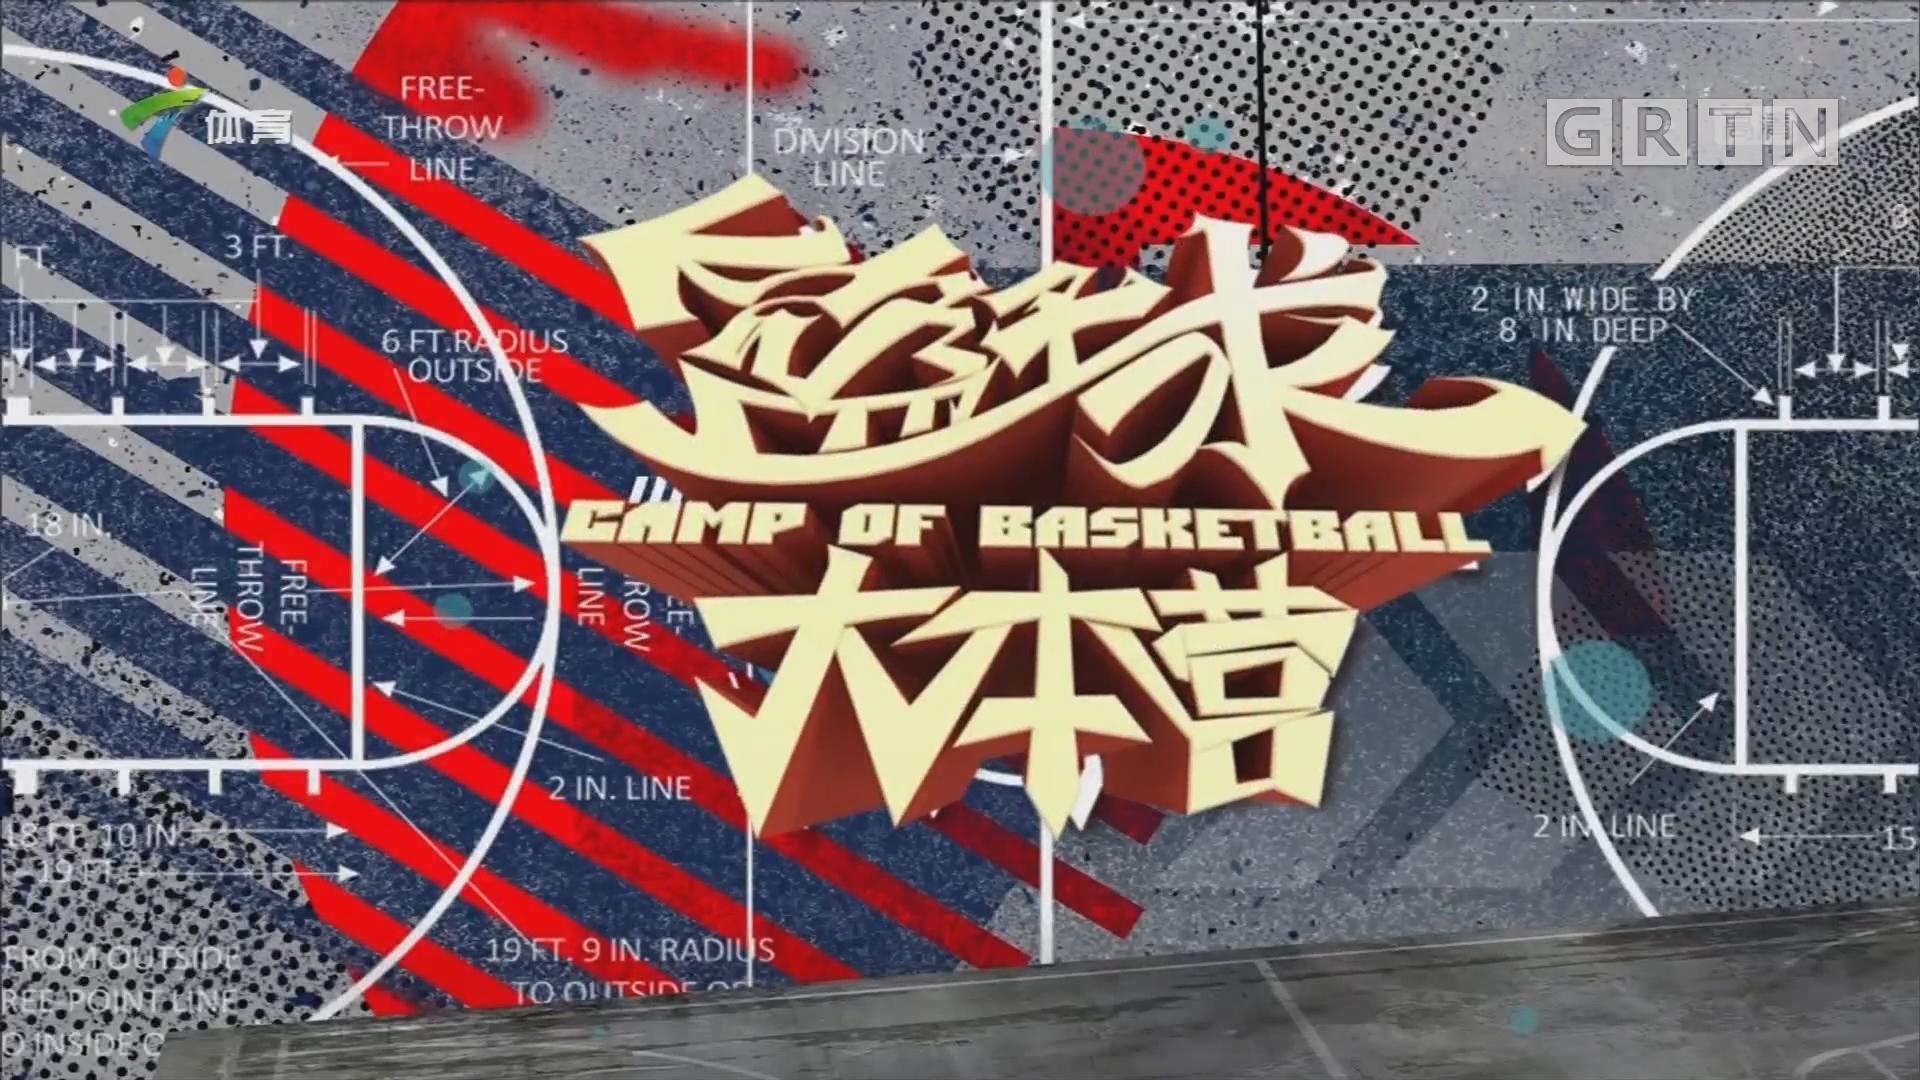 [HD][2019-05-06]篮球大本营:话题:广东以季后赛11连胜,以创纪录成绩夺冠